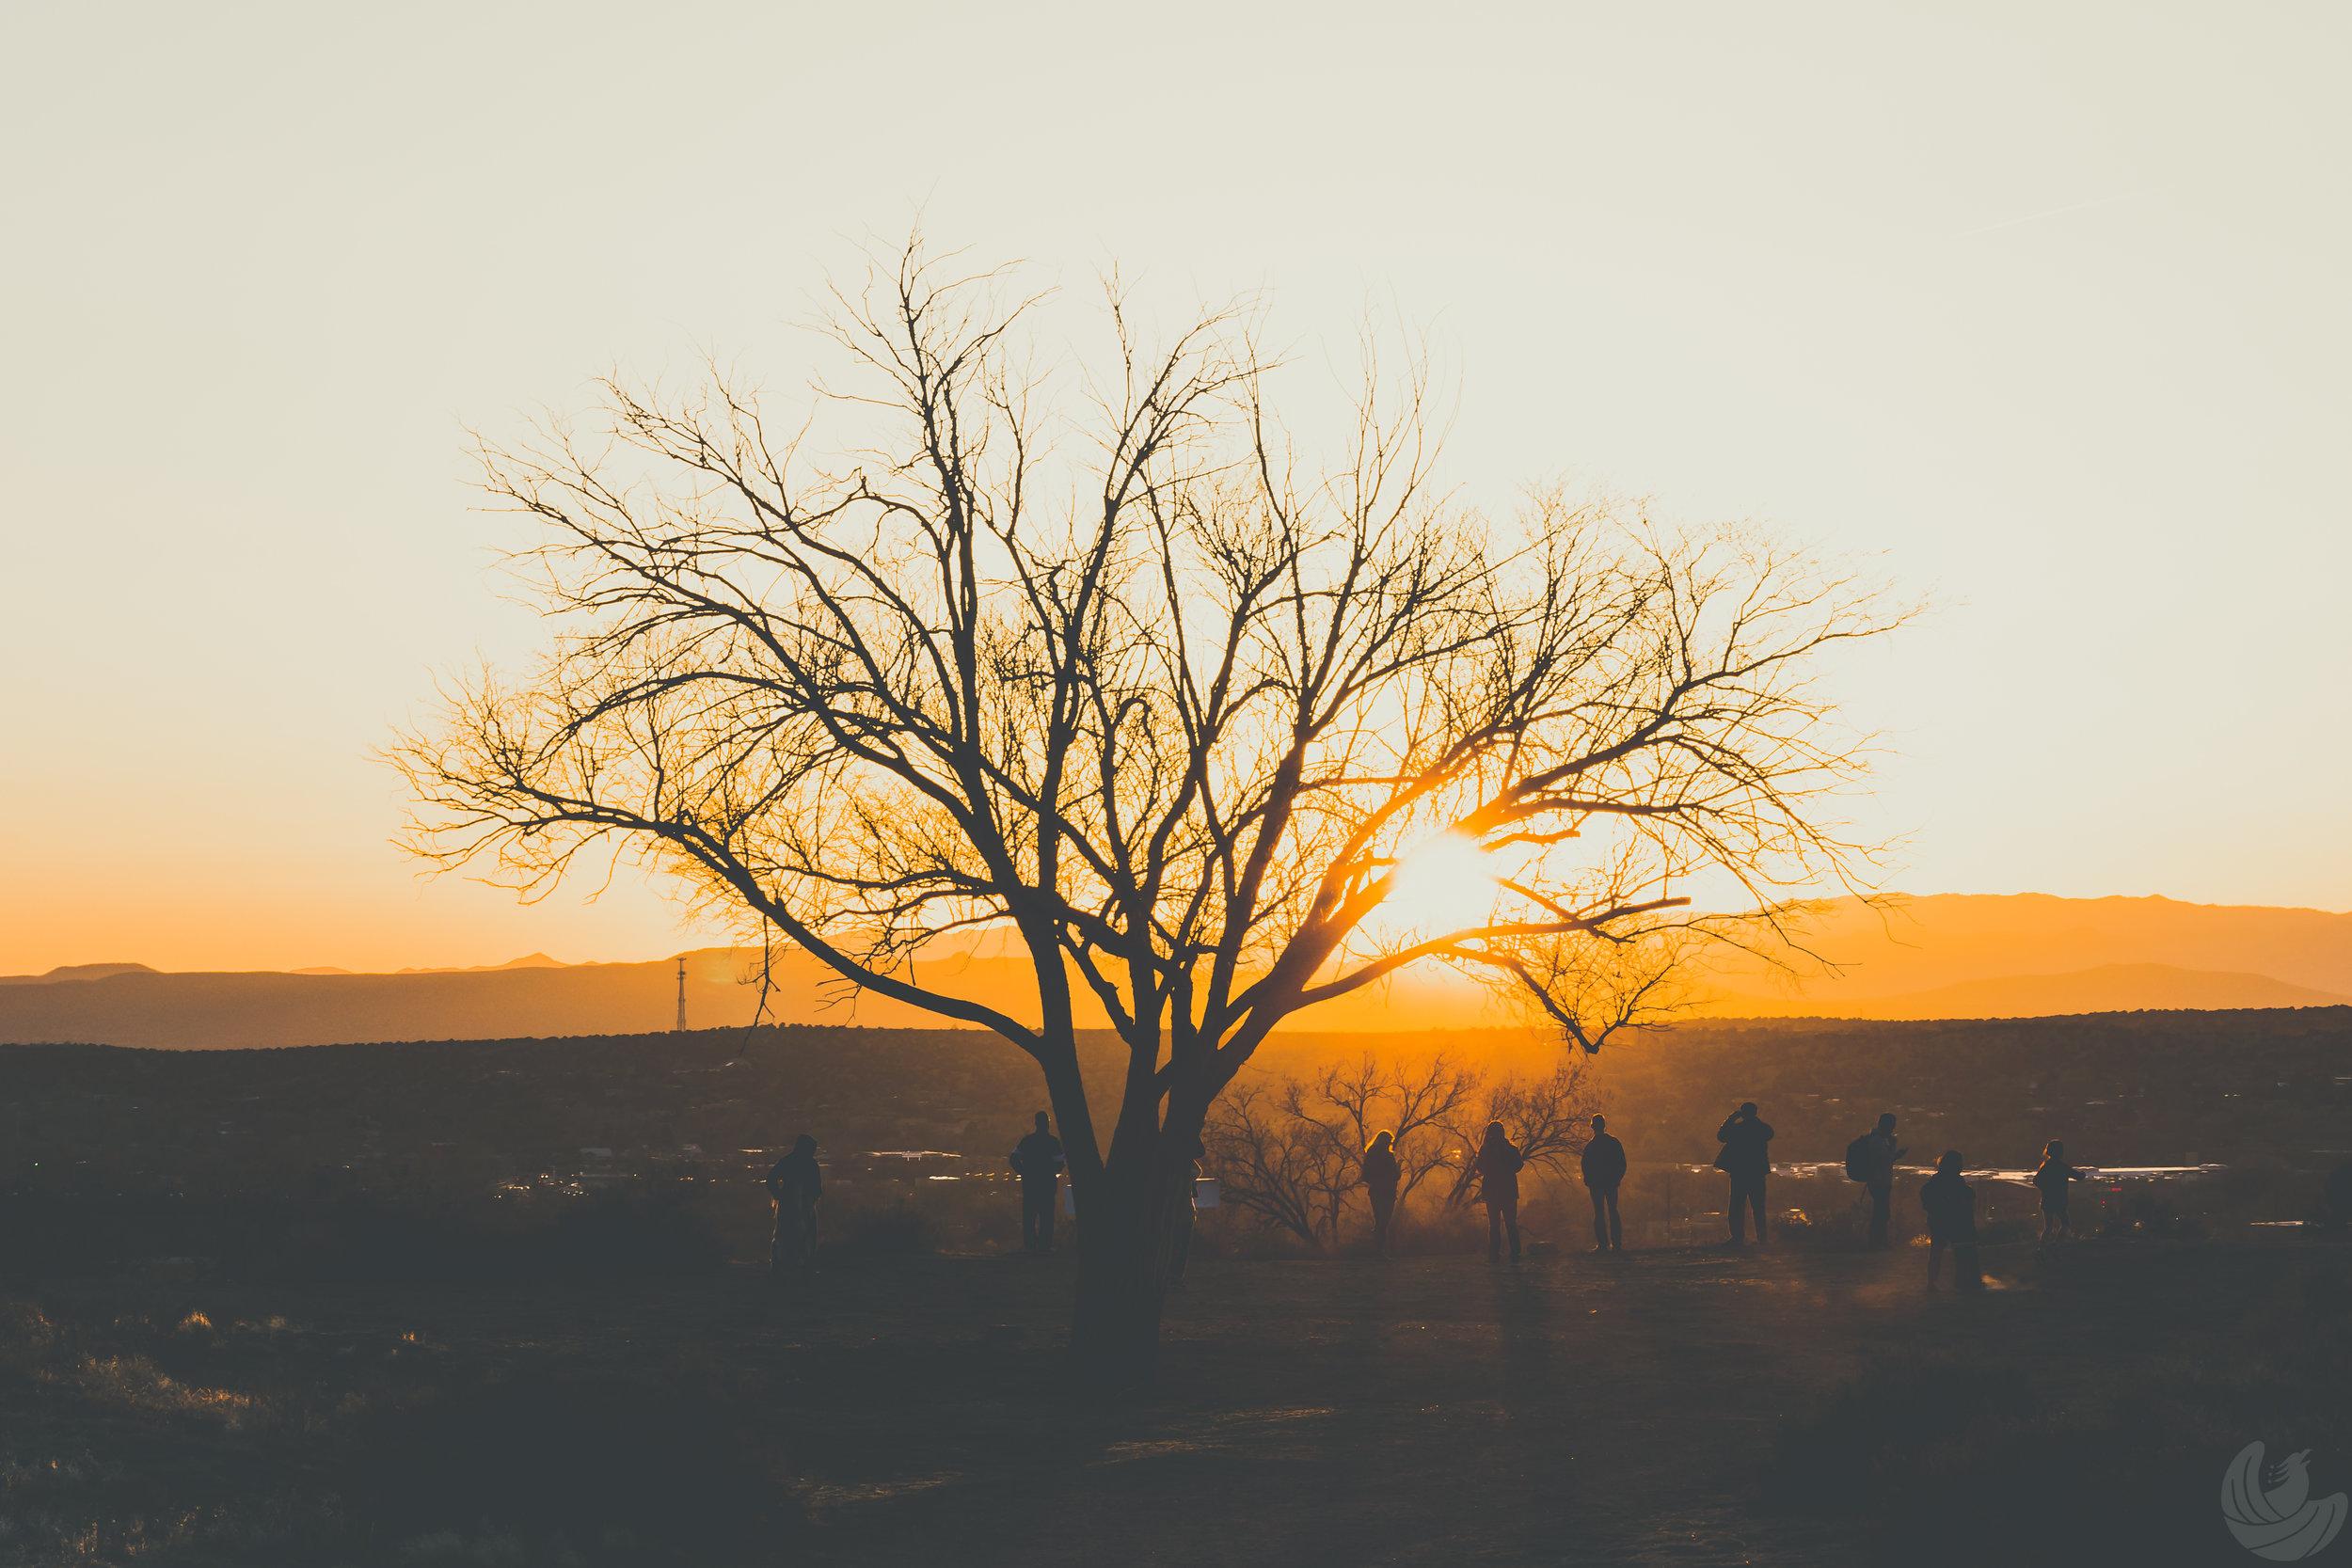 Treeoflife-1.jpg